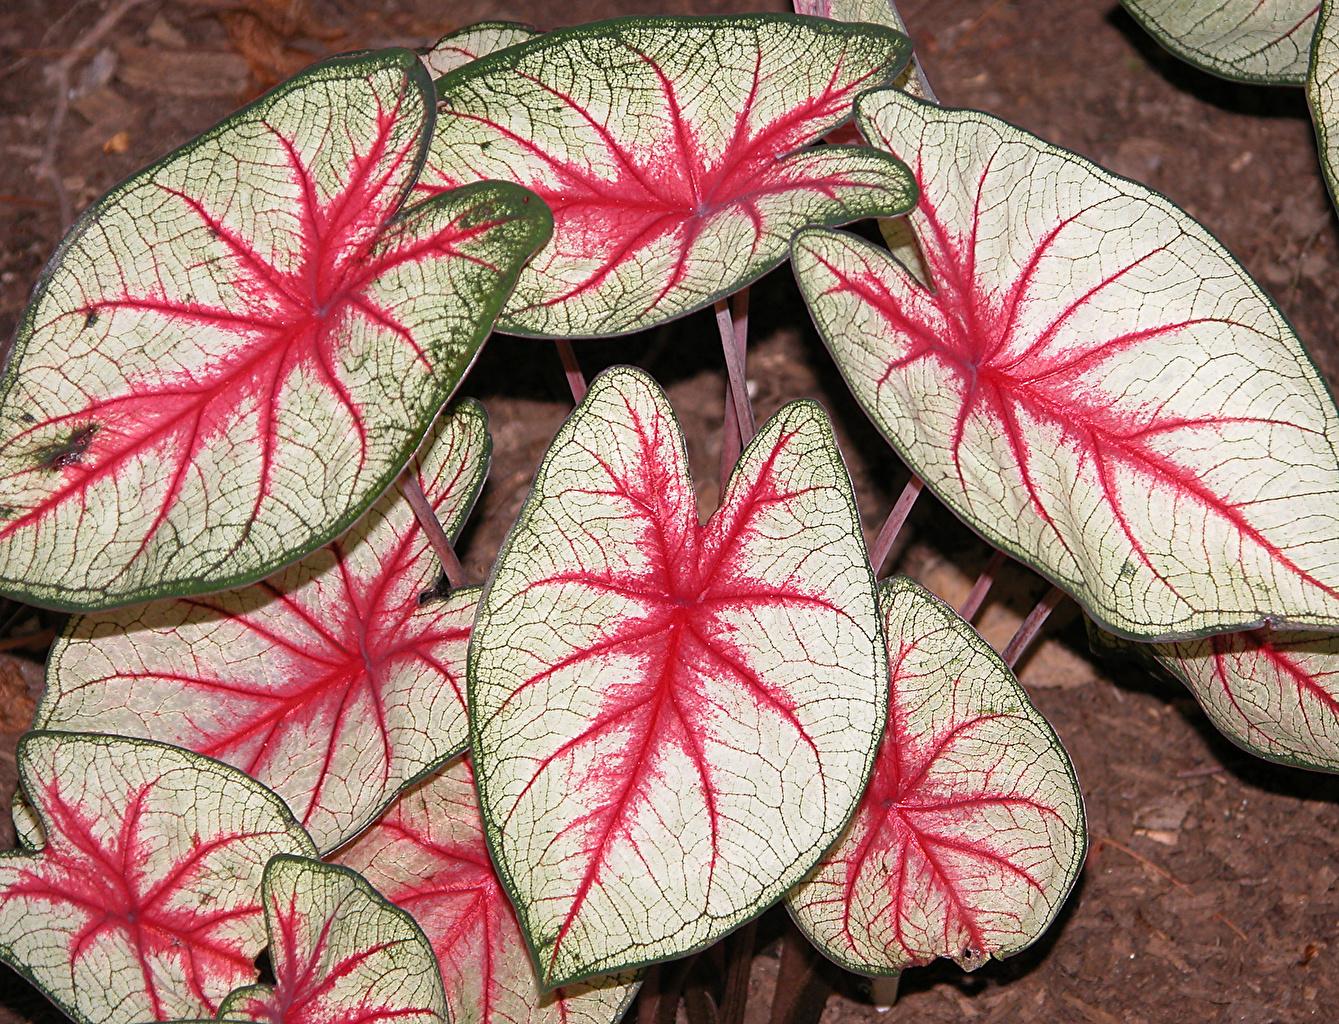 Fotos Blattwerk Blumen Kaladien Großansicht Blatt Blüte hautnah Nahaufnahme